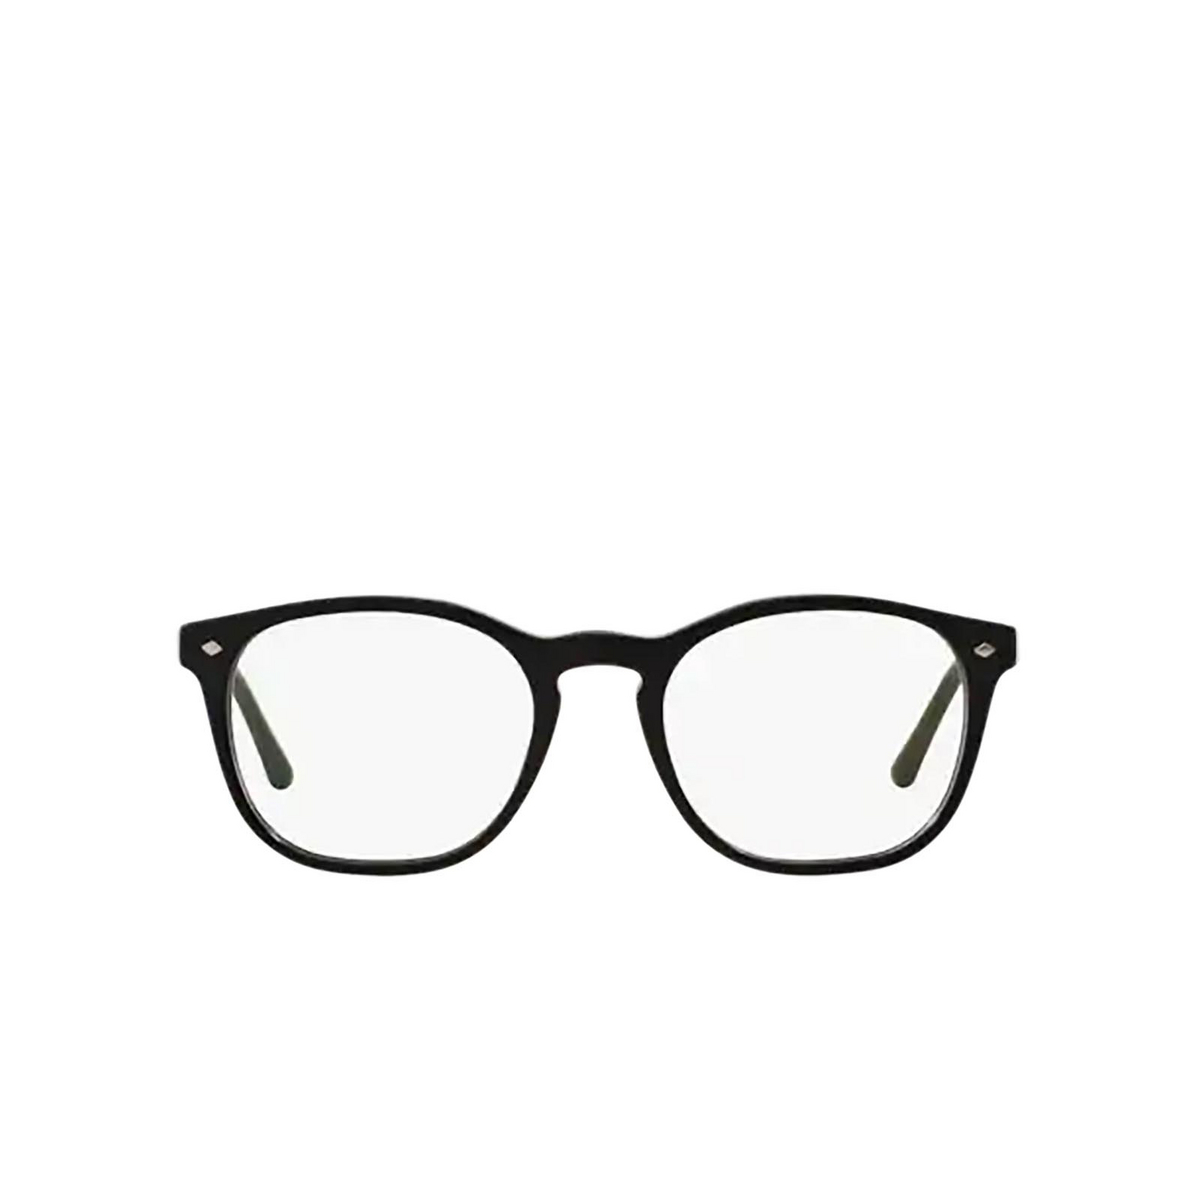 Giorgio Armani® Round Eyeglasses: AR7074 color Matte Black 5042 - front view.